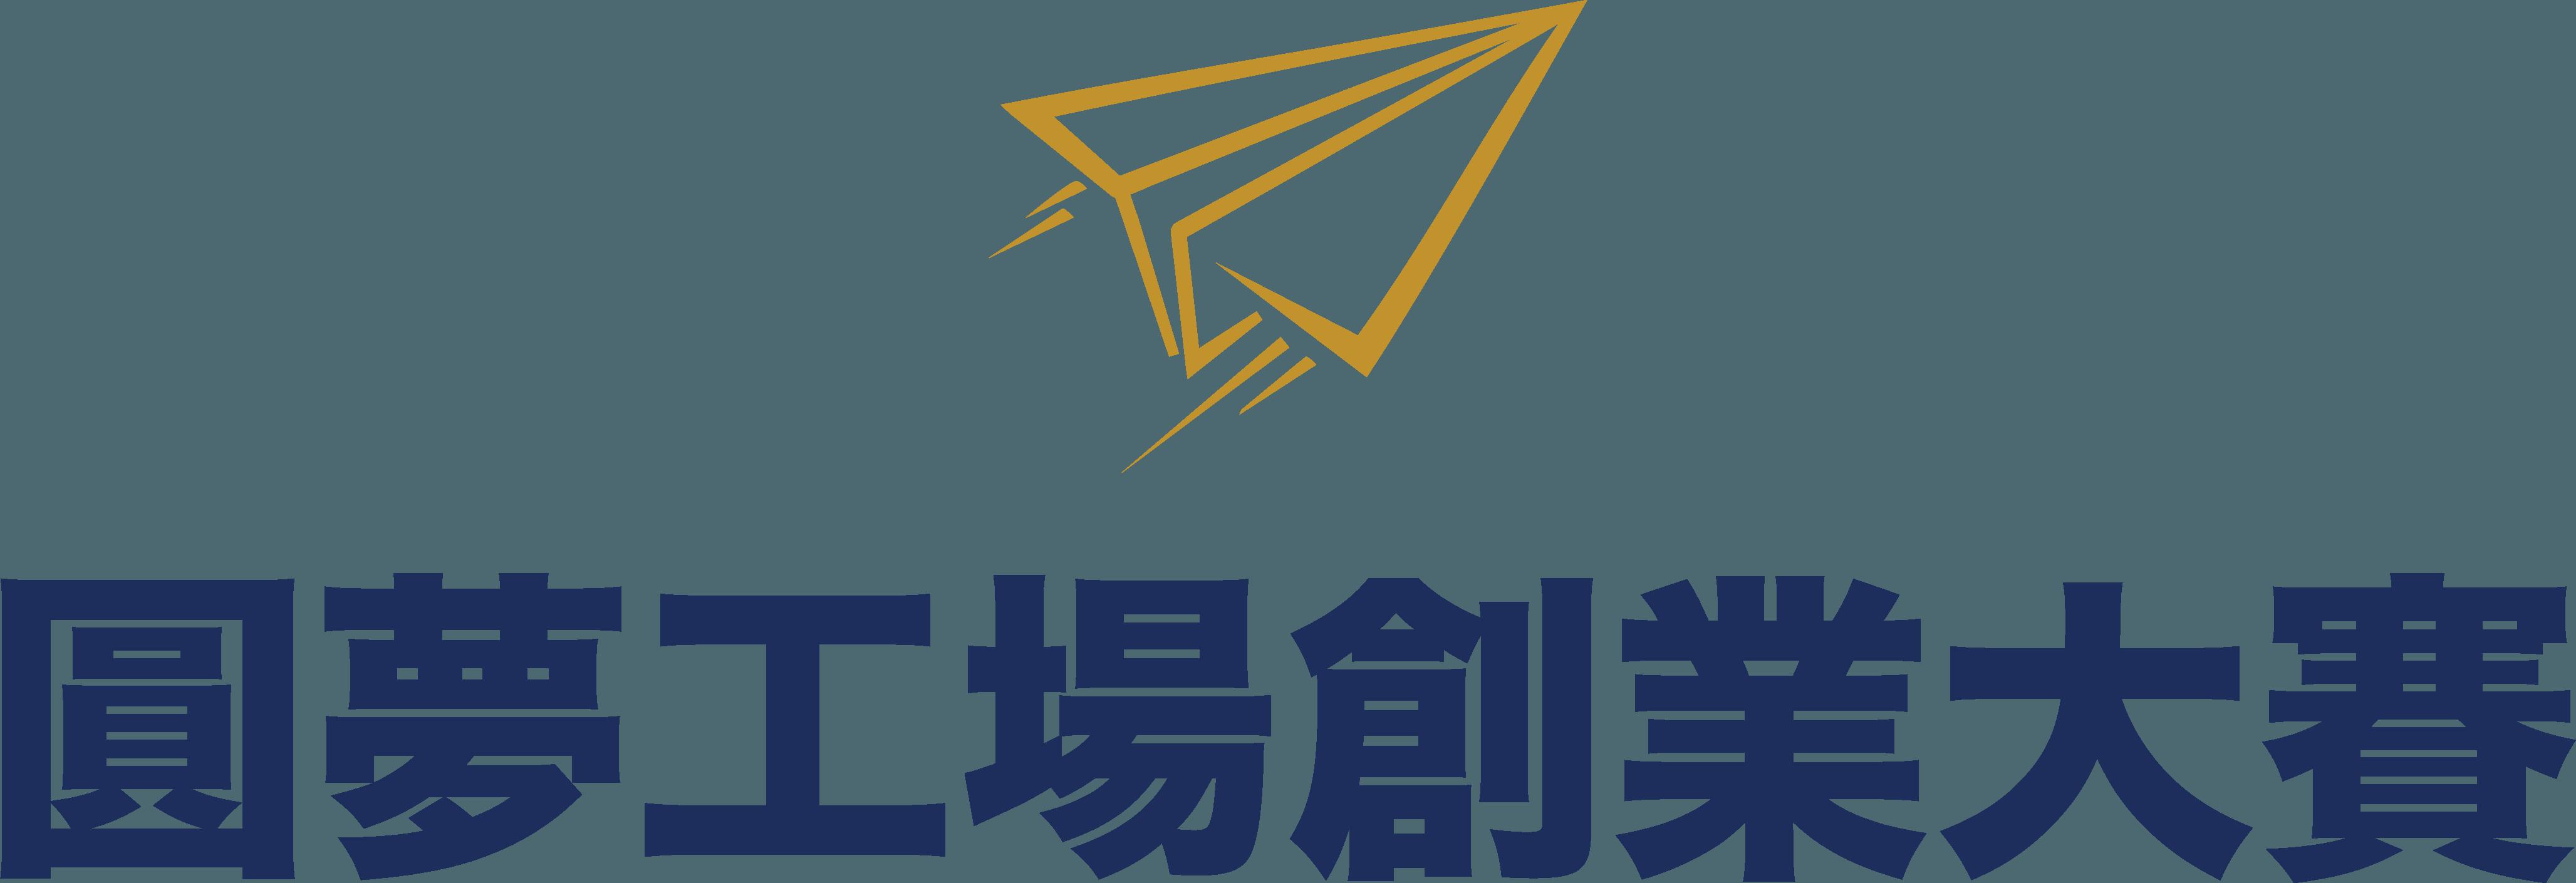 Dream Factory Startup Contest 圆梦工场创业大赛